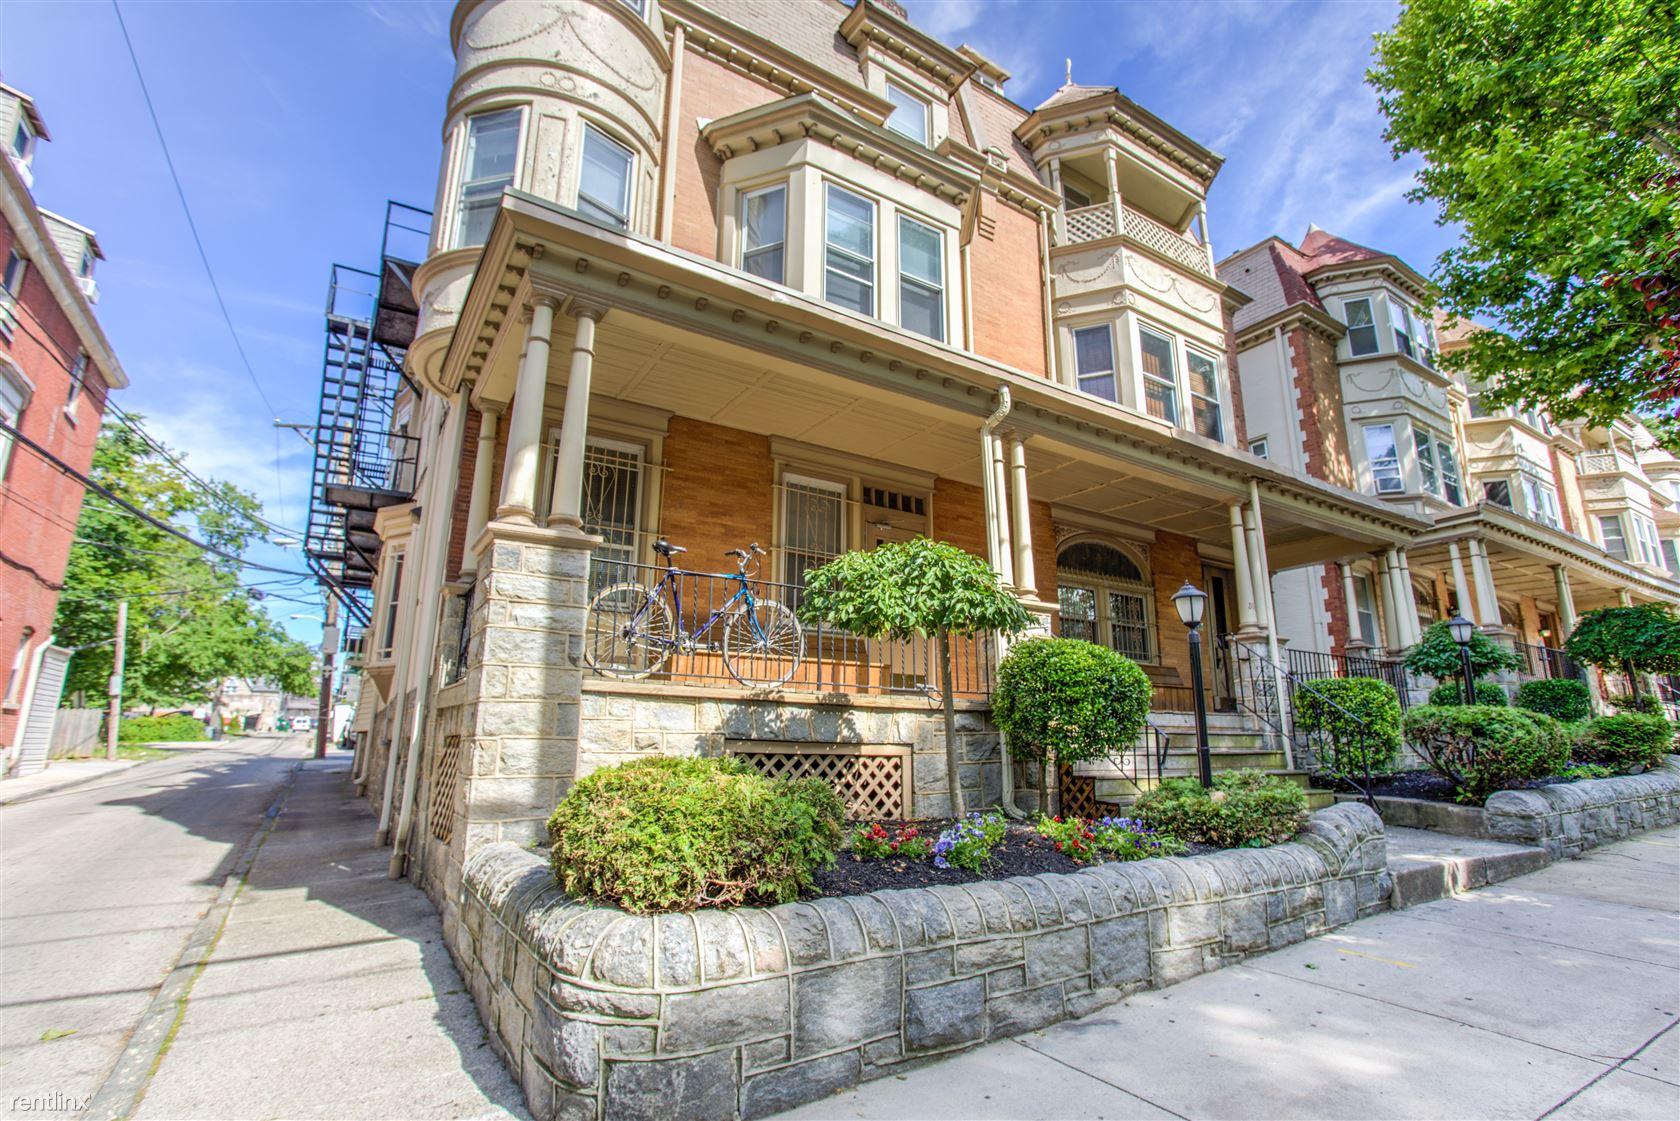 309 S 41st St, Philadelphia, PA - $2,800 USD/ month